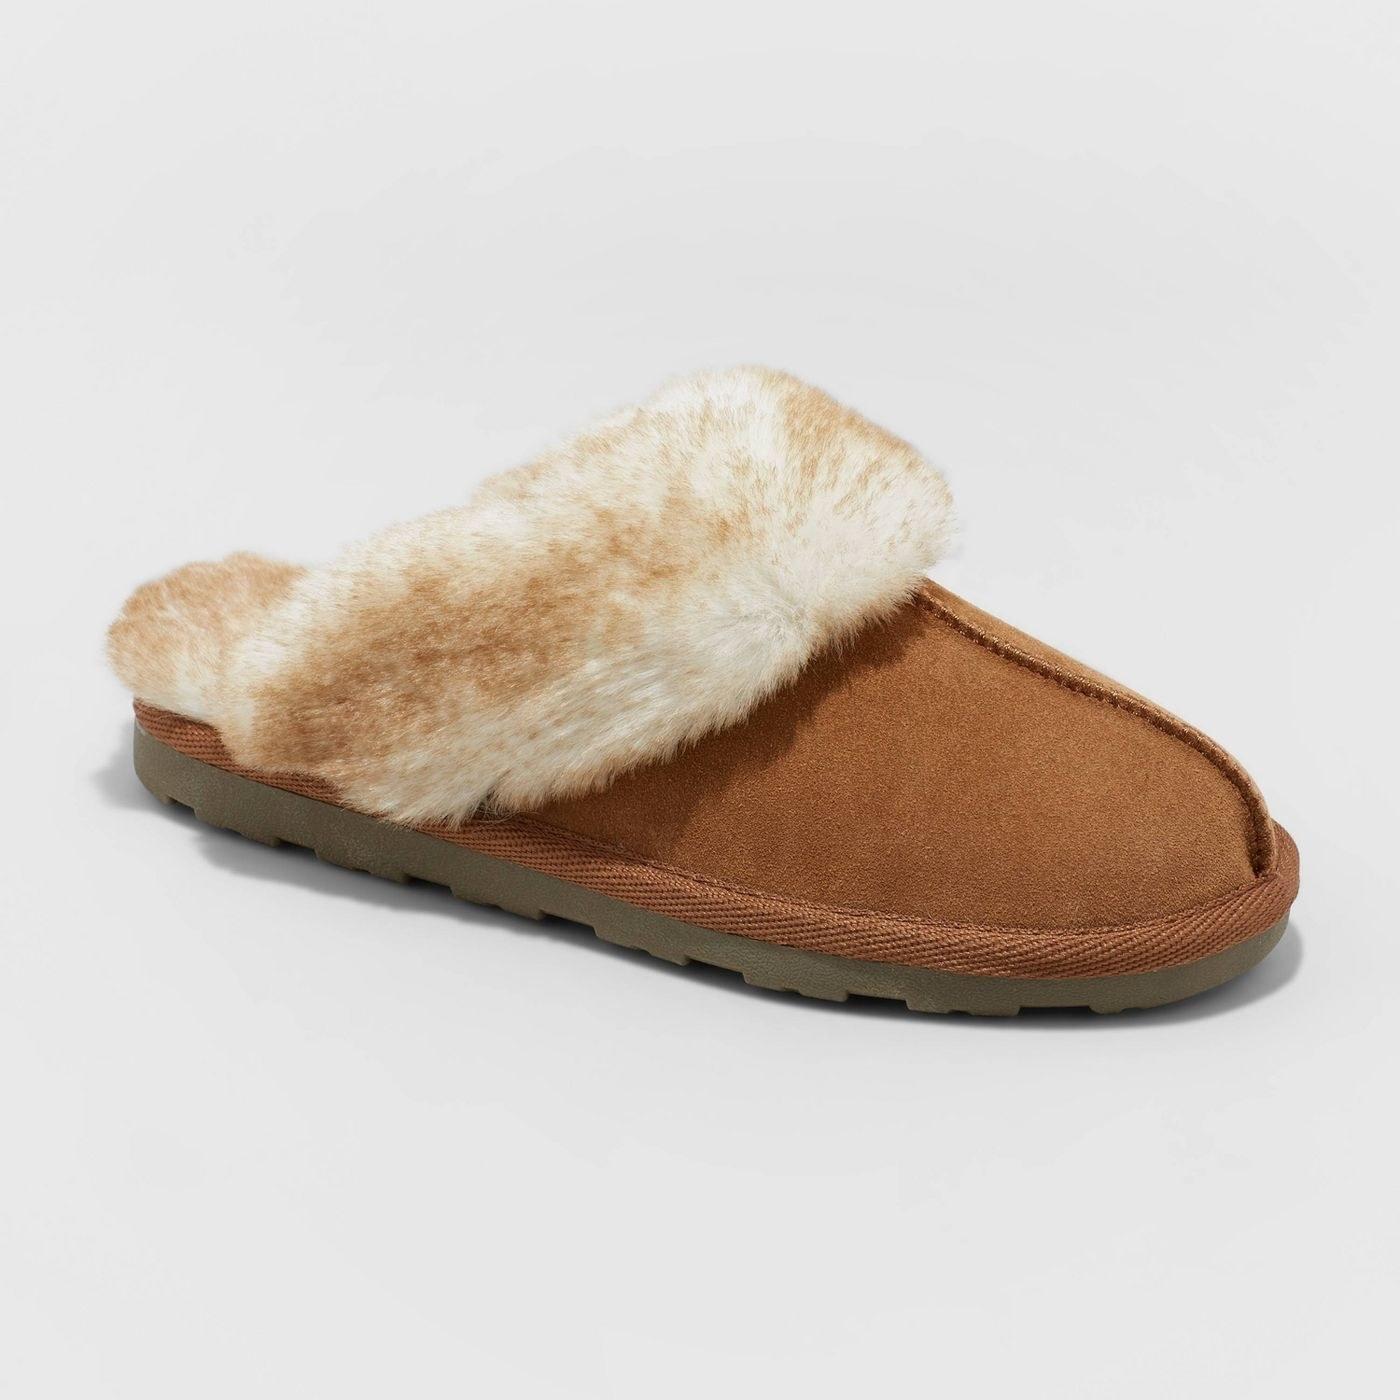 suede scuff slide slippers